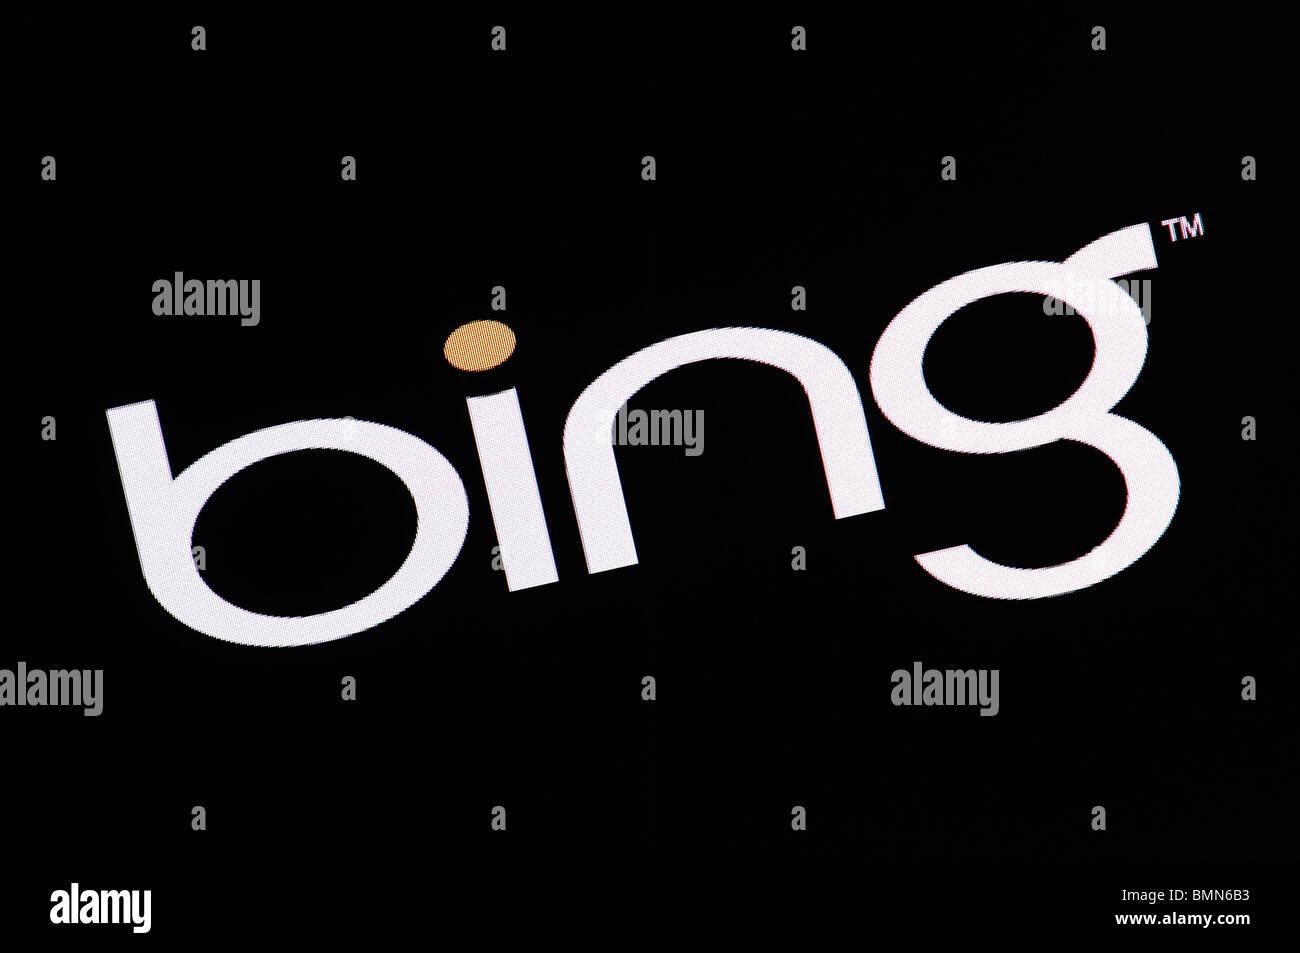 Bing Search Engine Screenshot - Stock Image